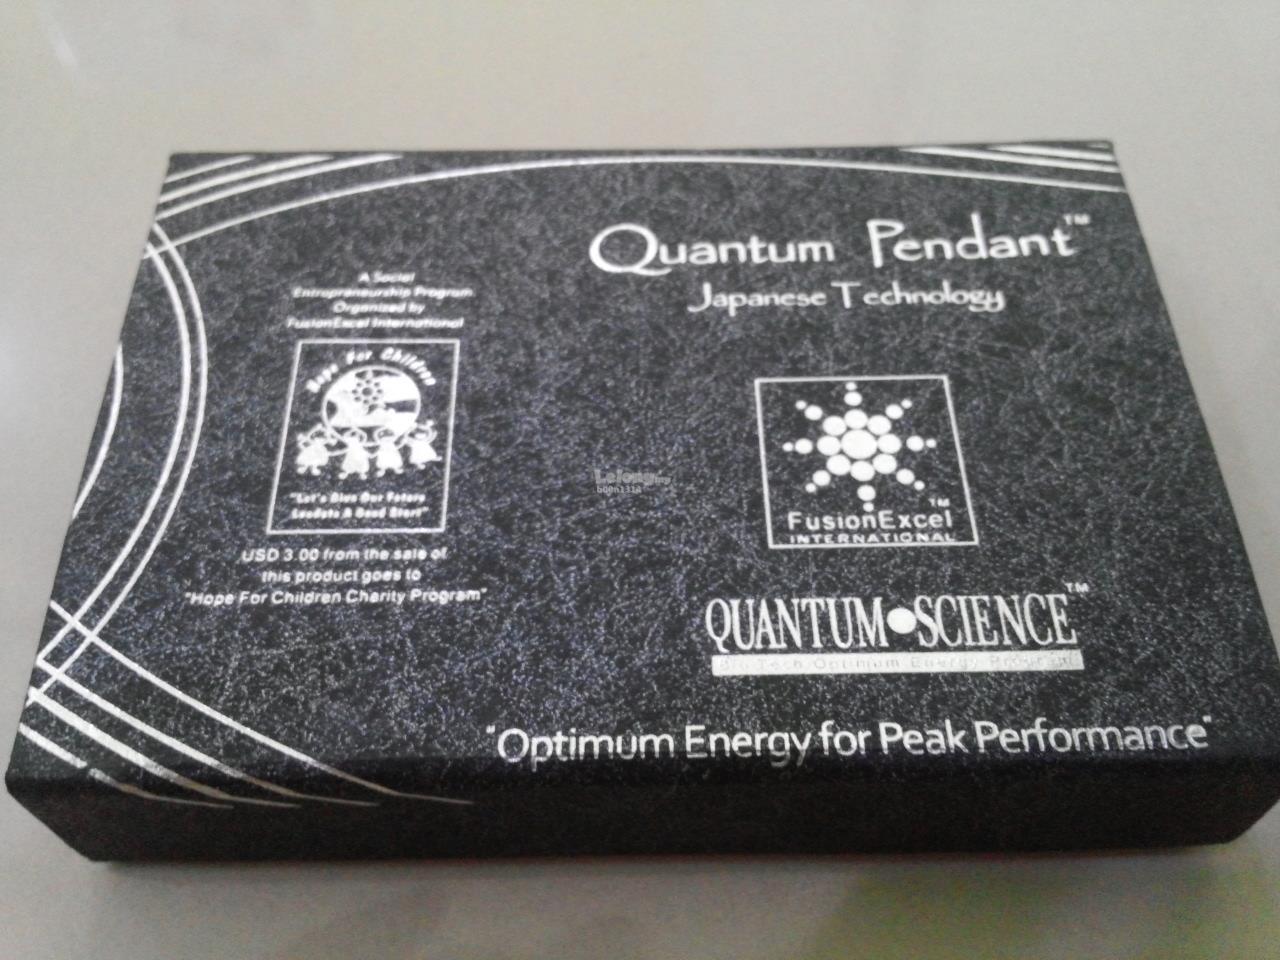 Fusion excel quantum pendant genu end 10122016 1115 am fusion excel quantum pendant genuine mozeypictures Choice Image